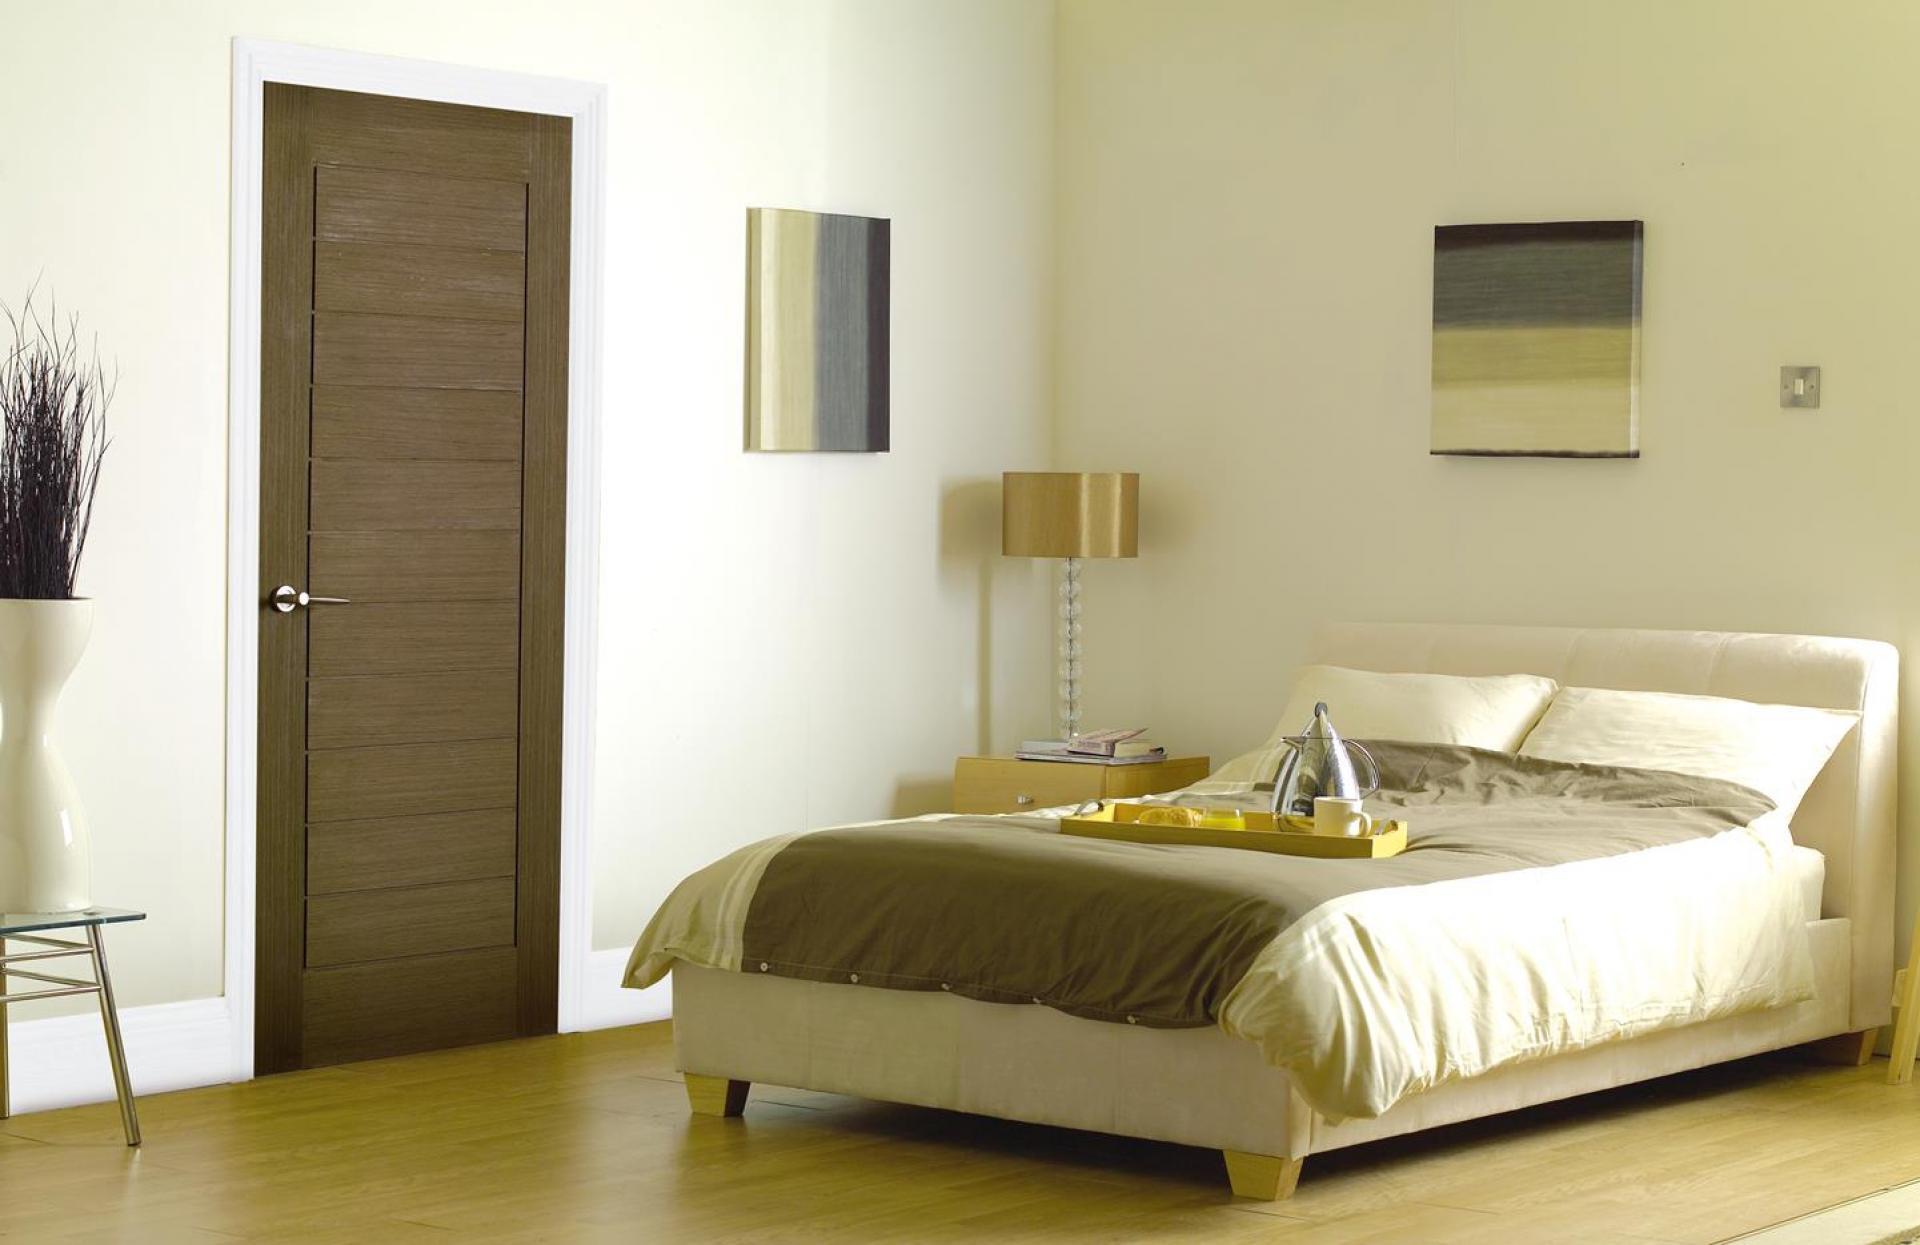 LPD Doors and Accessories & LPD Doors - Interior and Exterior | Blueprint Joinery